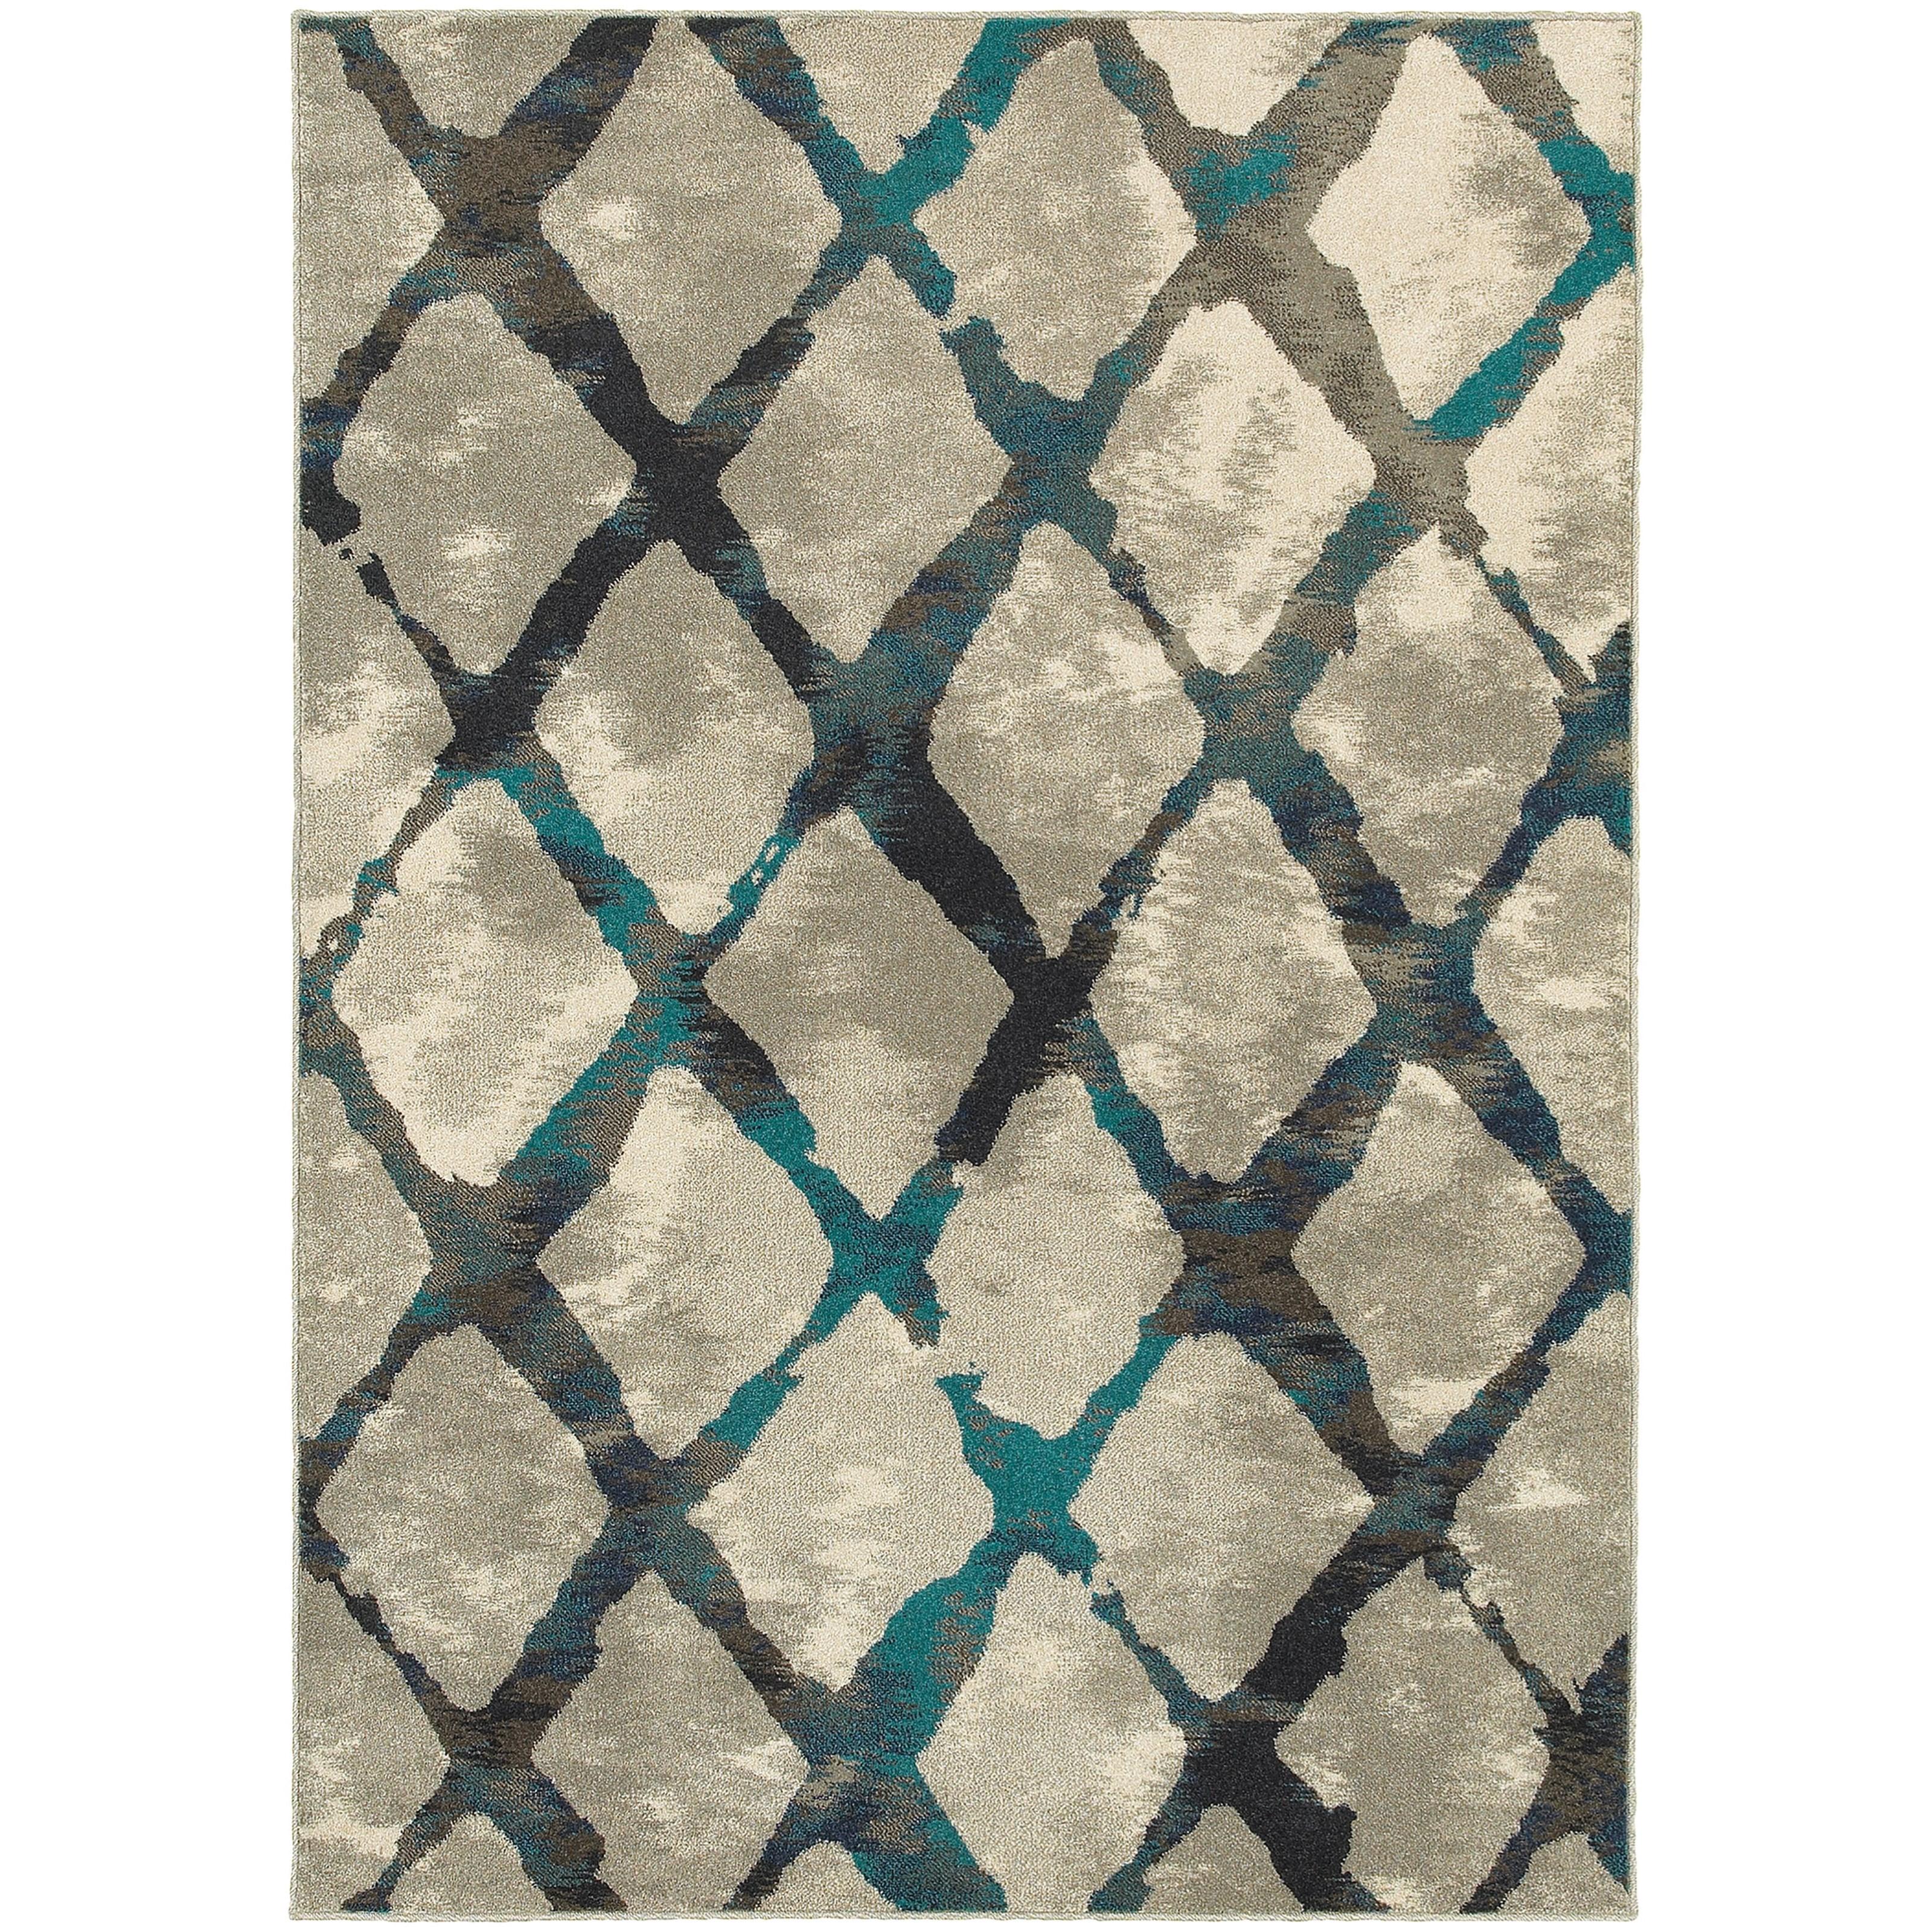 "Oriental Weavers Highlands 7'10"" X 10'10"" Rectangle Area Rug - Item Number: HIG6613A710X1010"